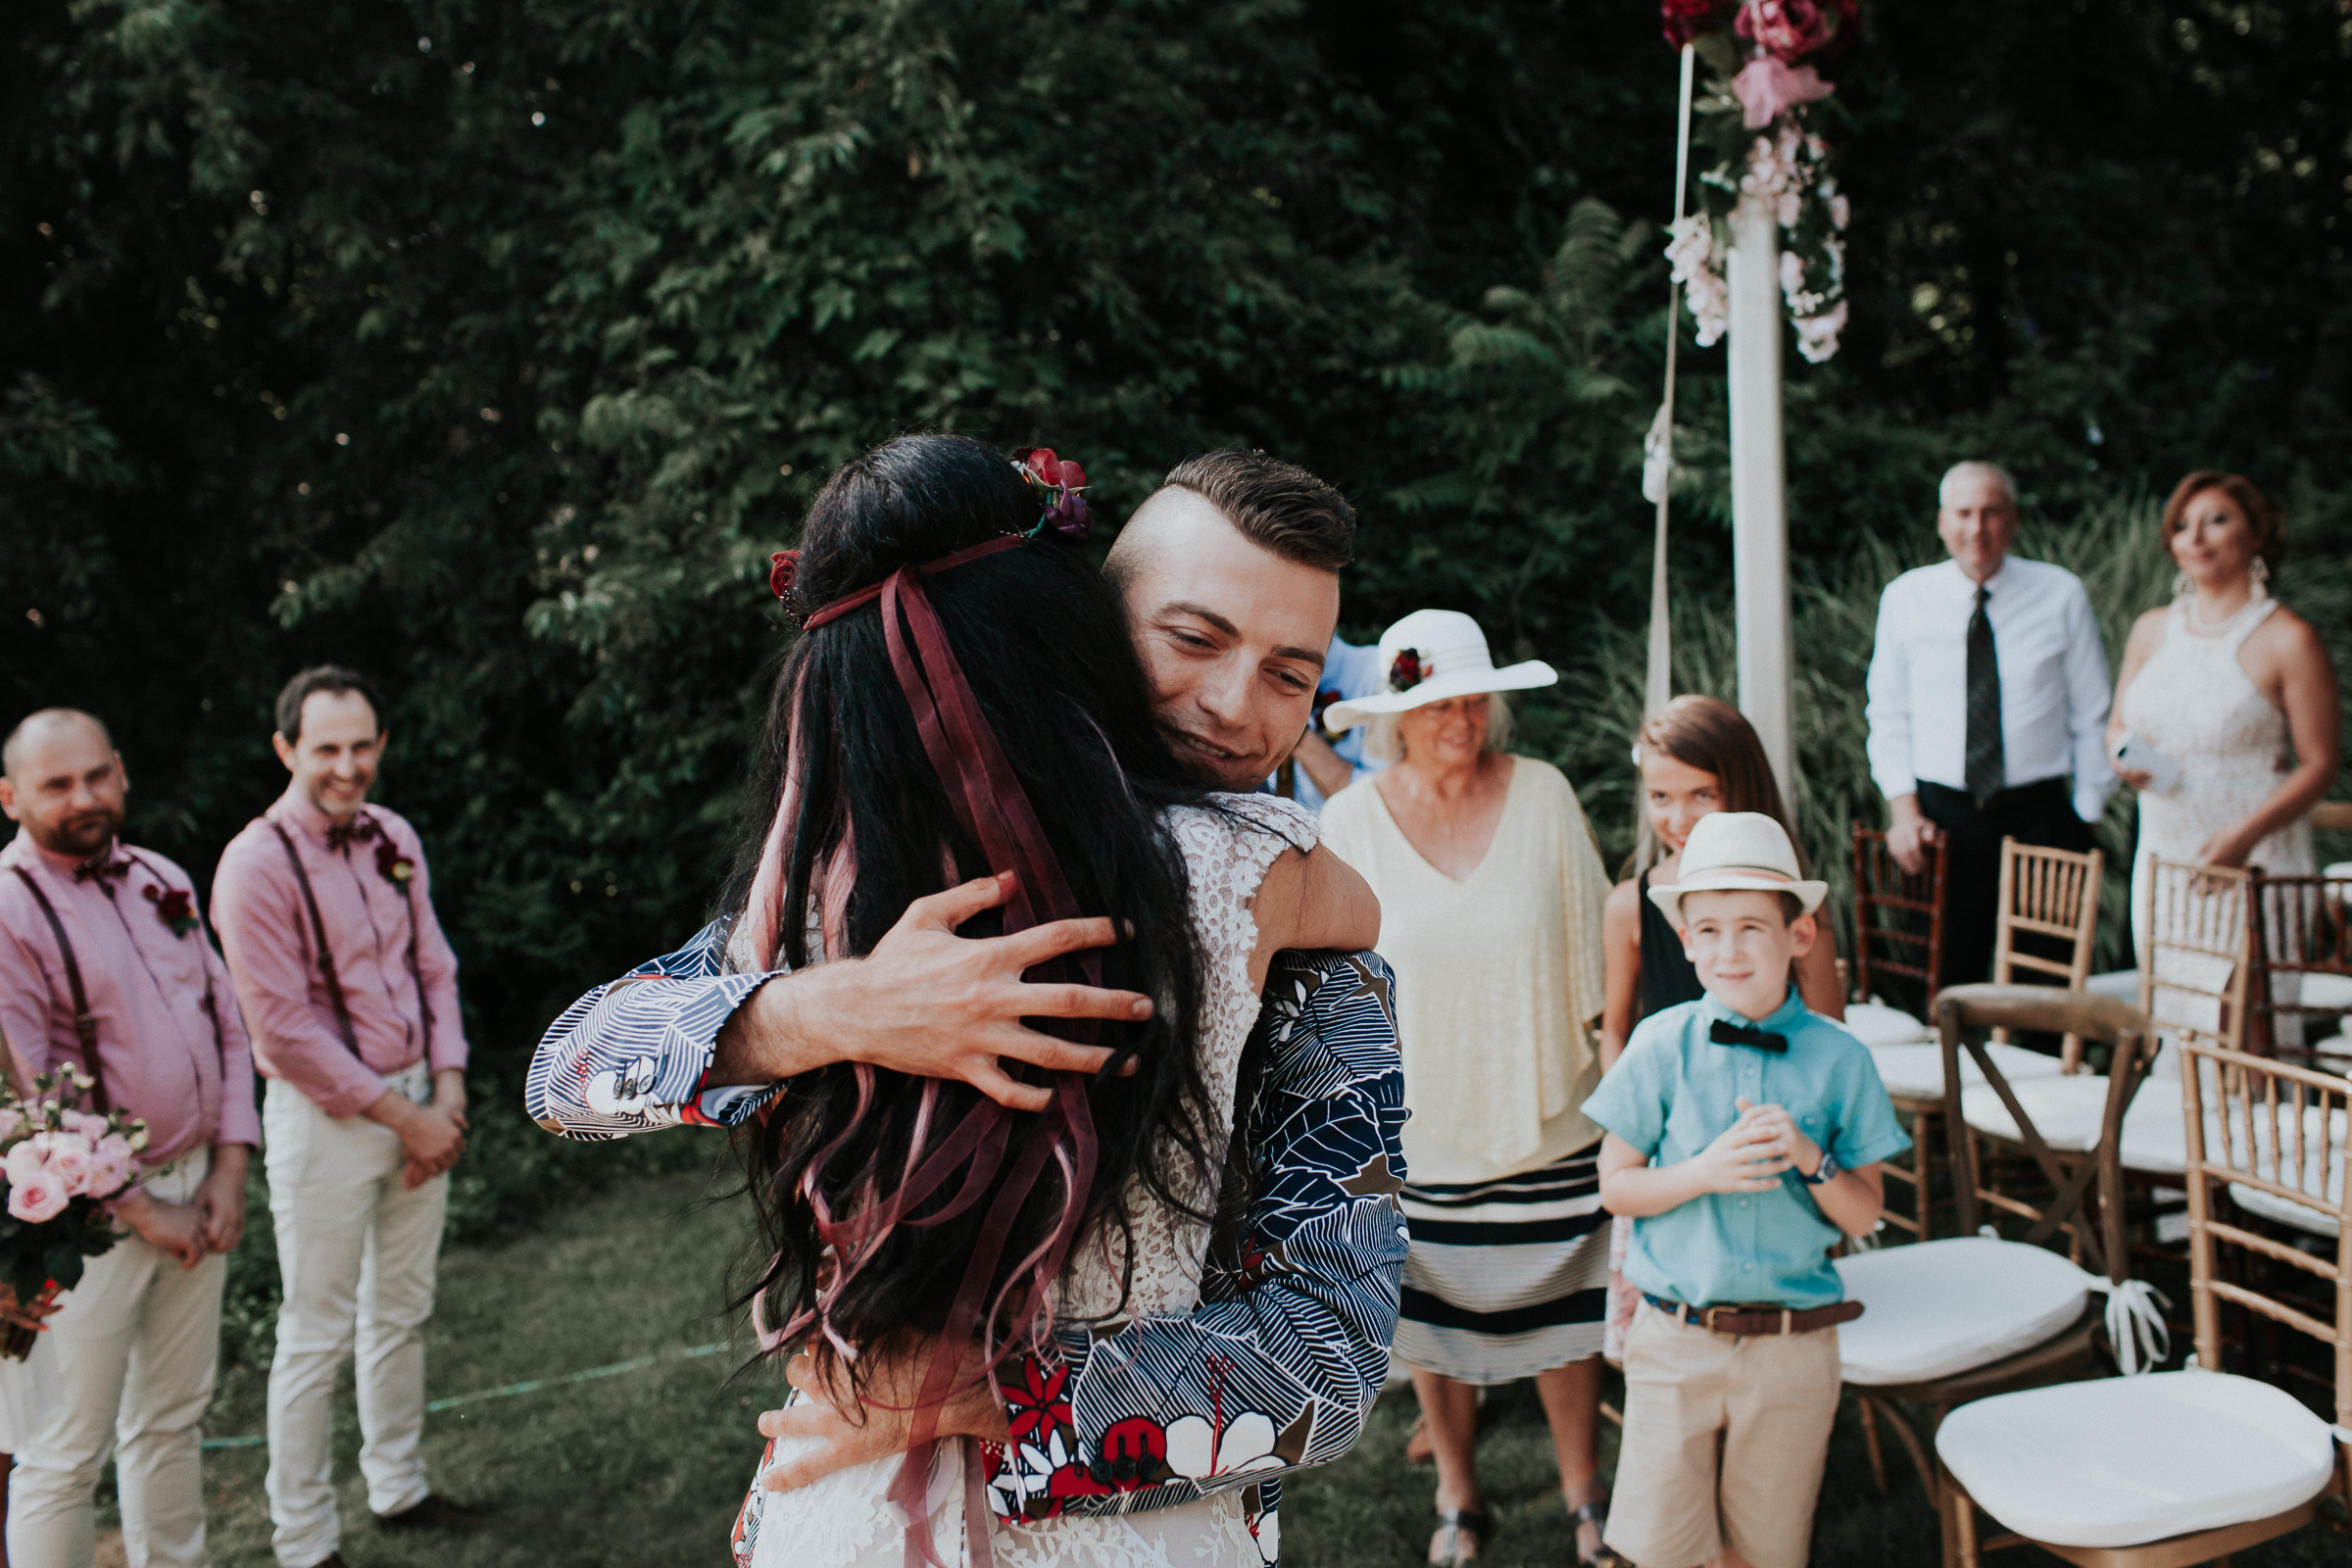 Backyard-Intimate-Adventurous-Destination-Wedding-Darien-Connecticut-Documentary-Wedding-Photography-55.jpg